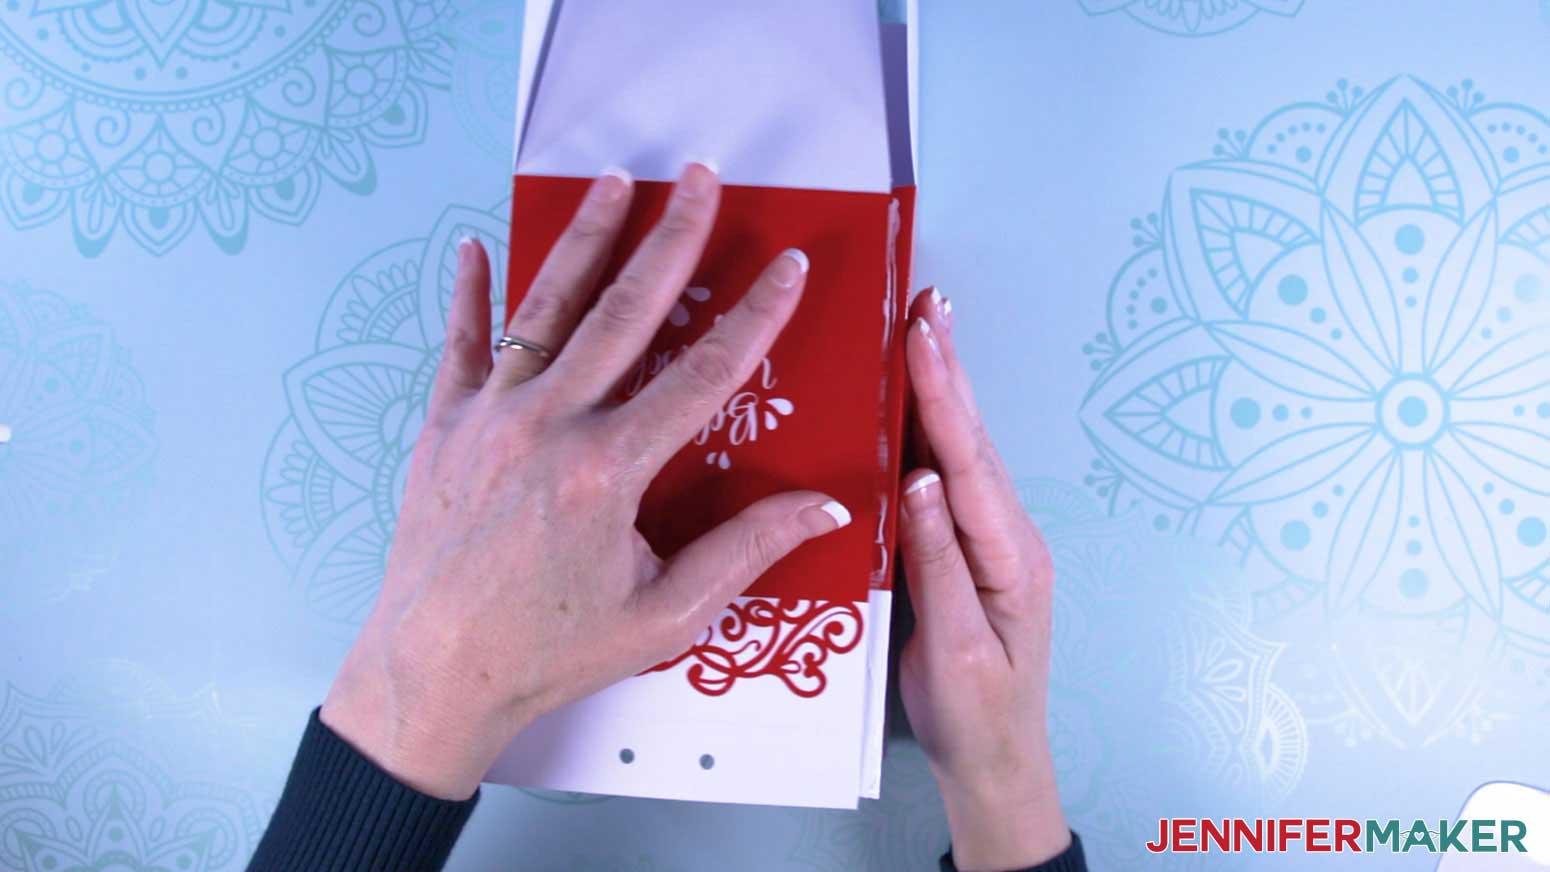 Attach the milk carton mug gift box sections to enclose the box